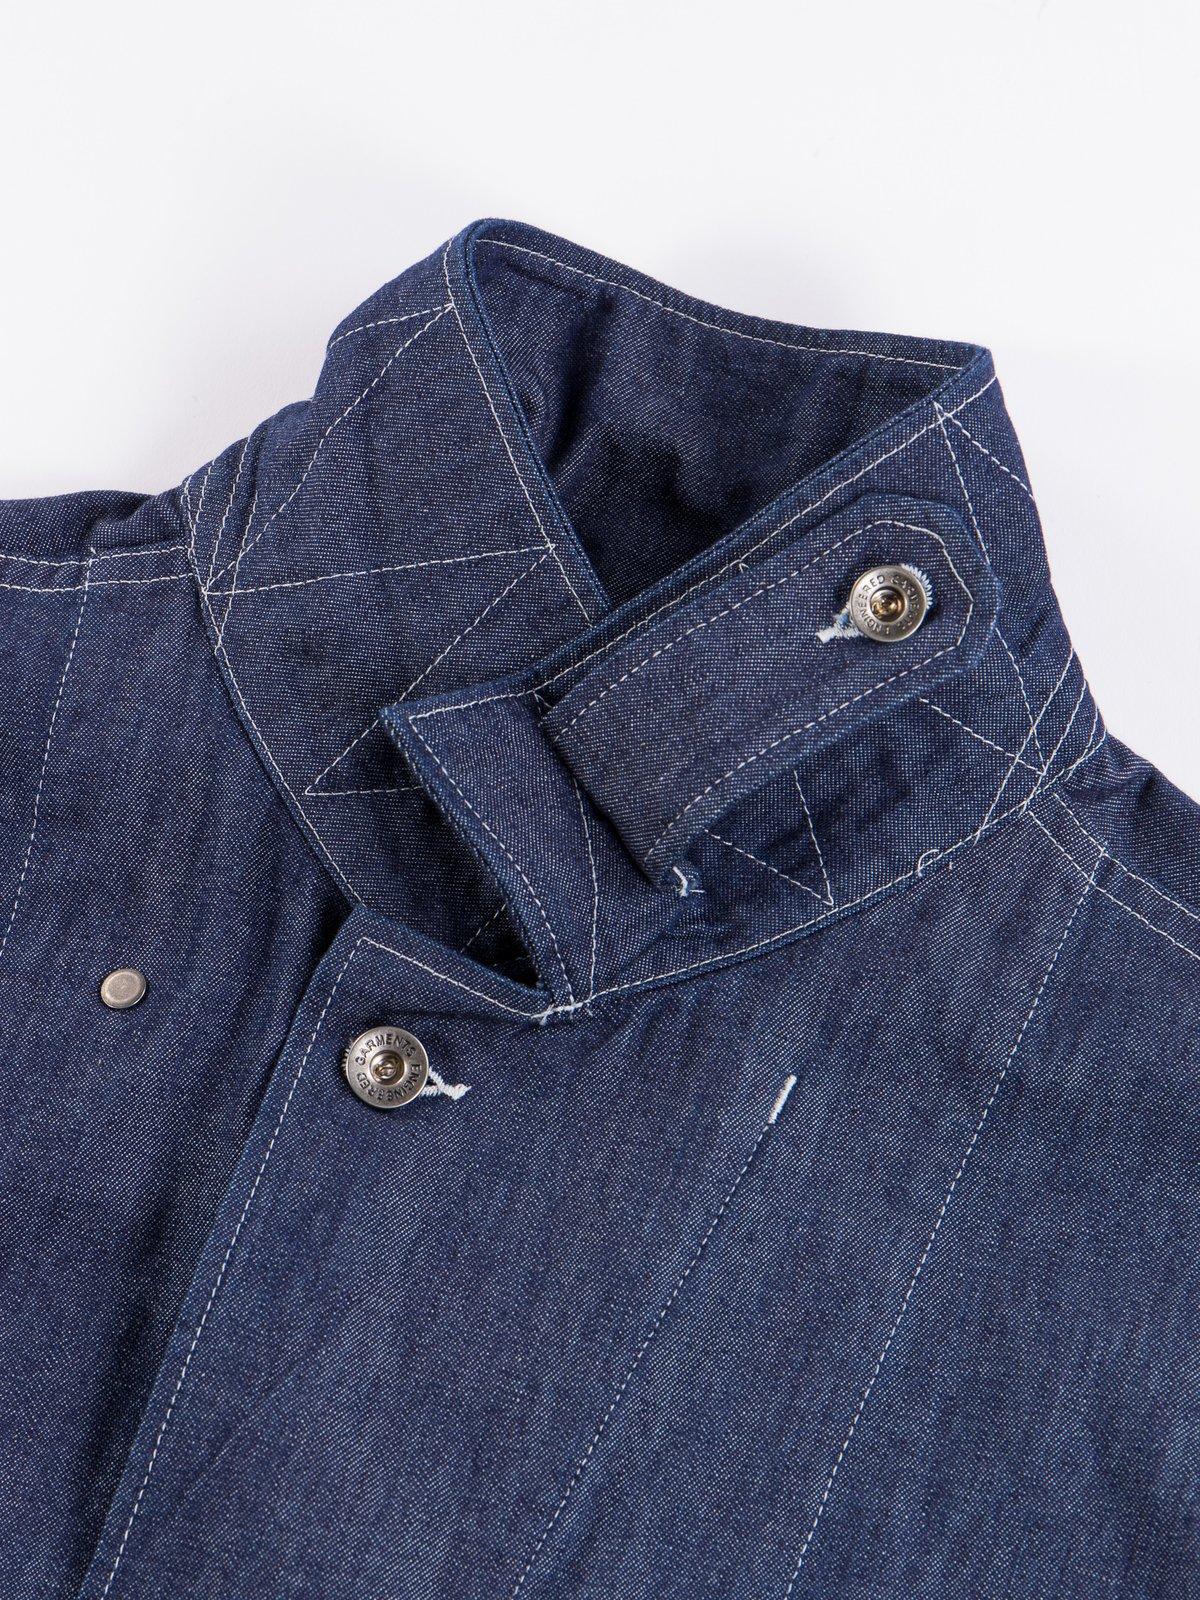 Indigo 8oz Cone Denim M43/2 Shirt Jacket - Image 6